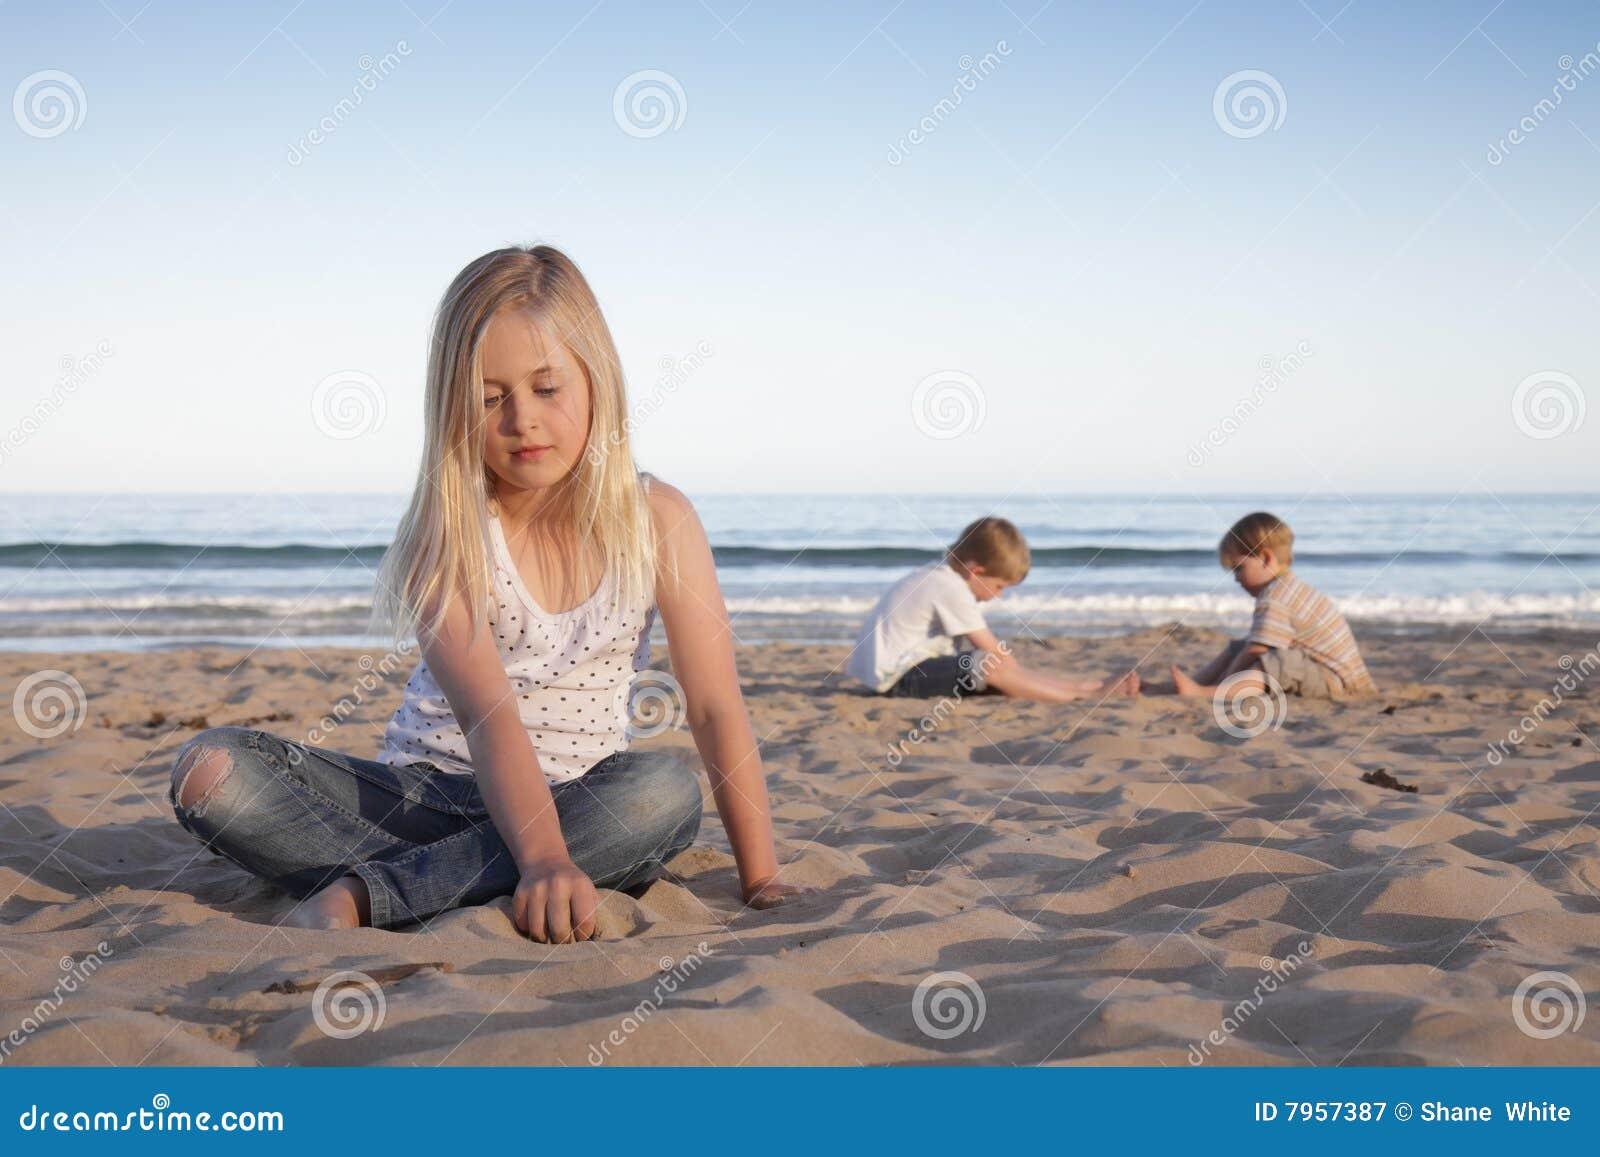 Strandkinder.